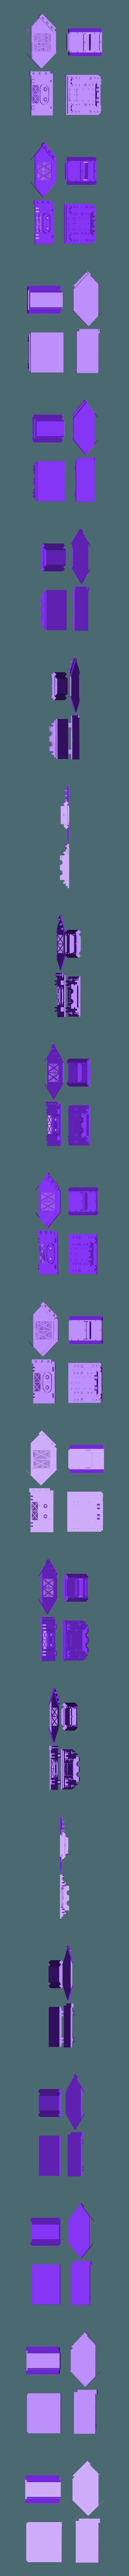 big_turret_walls_1.stl Download free STL file Big Plasma Cannon Turret • 3D printing design, JtStrait72